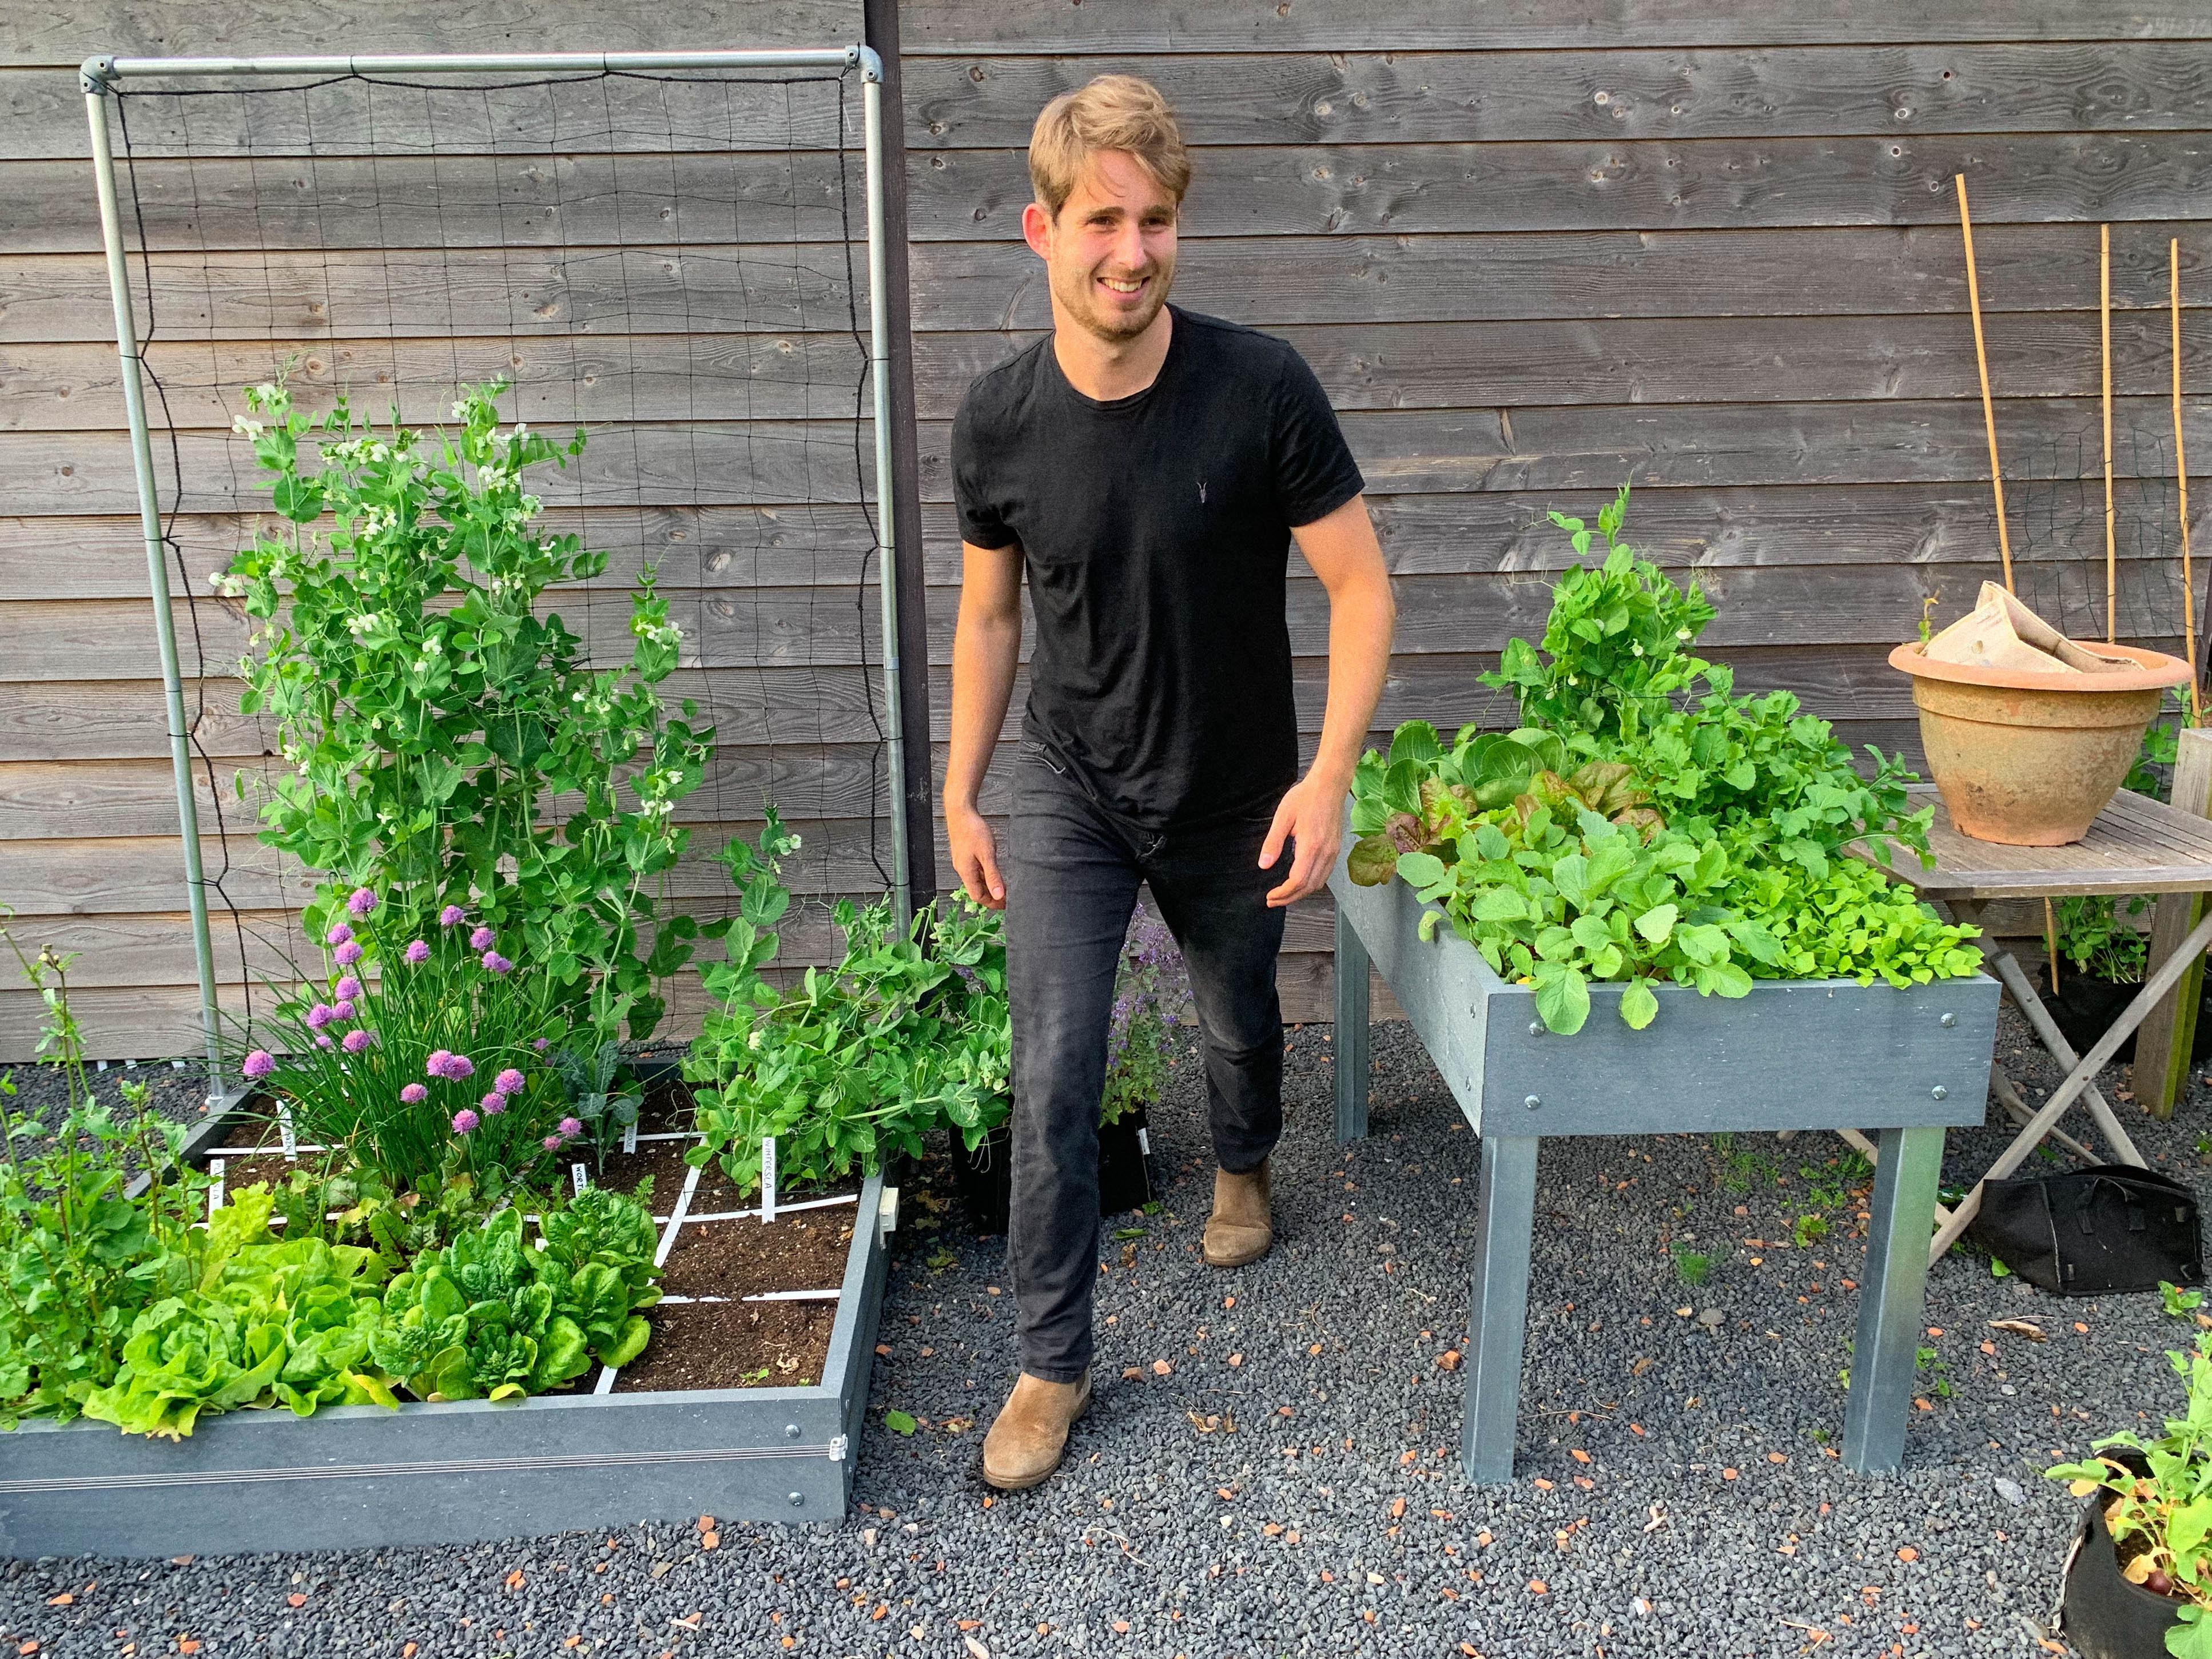 jelle in his Planty Garden